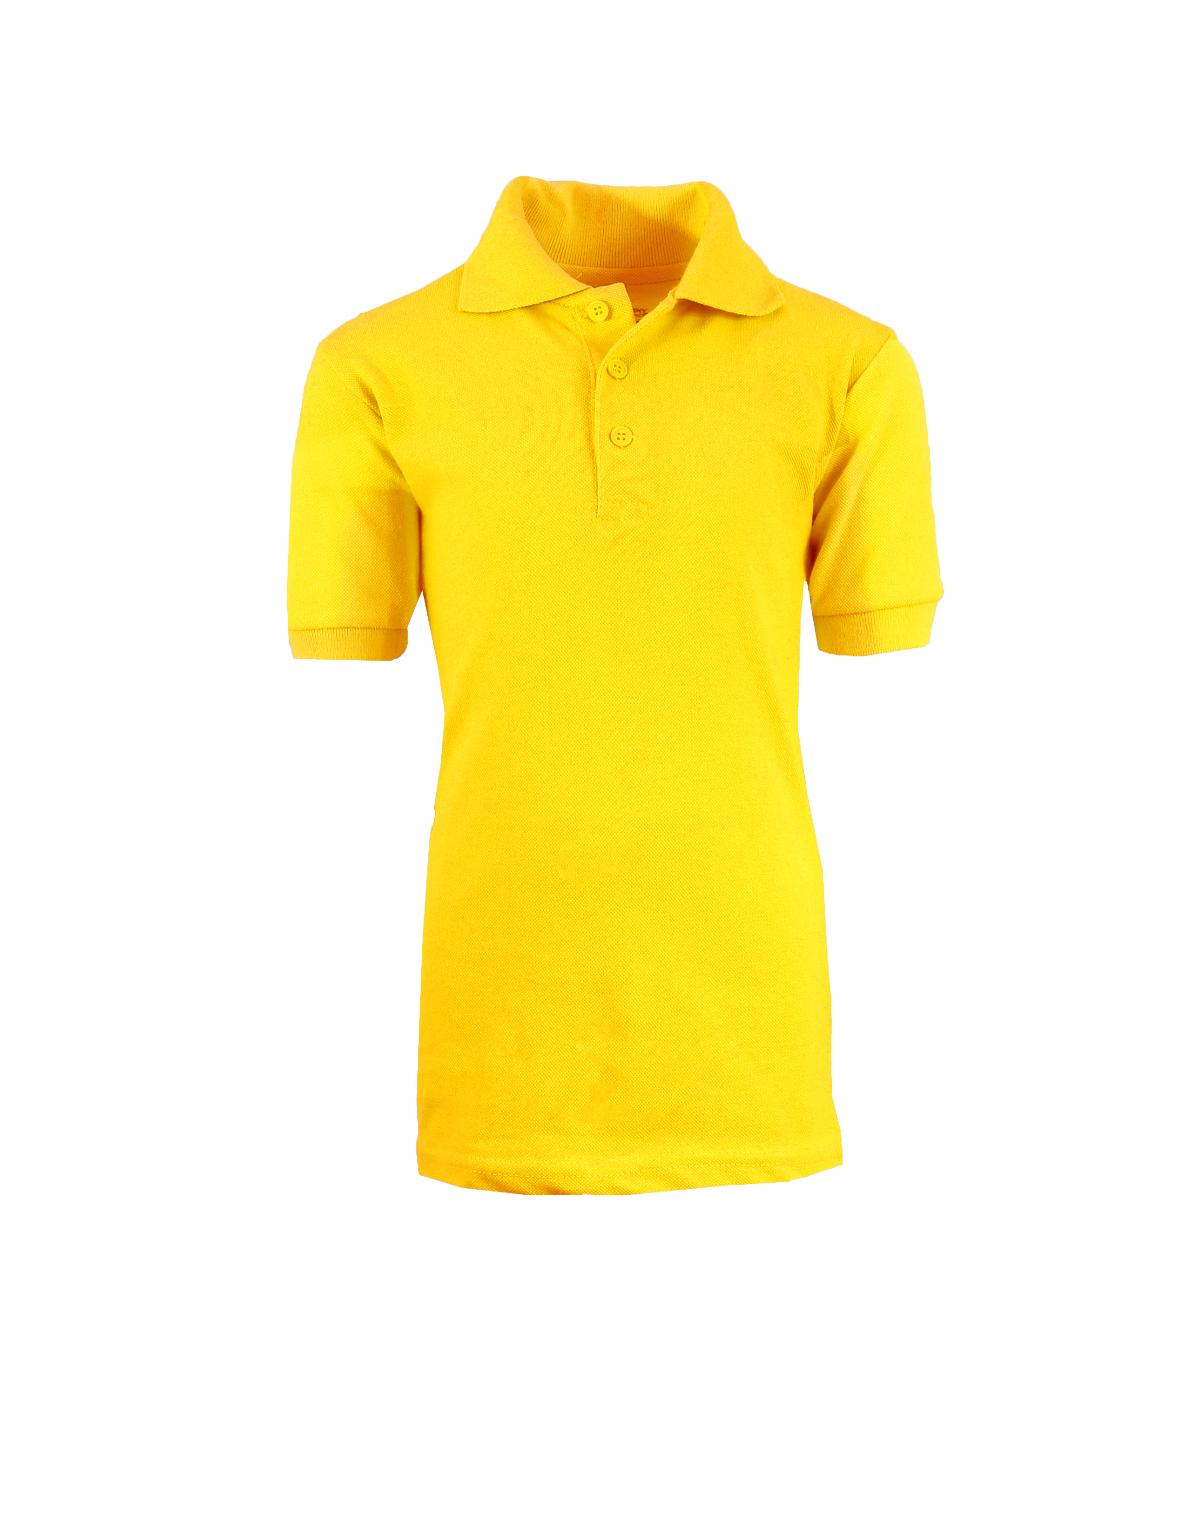 141ba165a Wholesale Boys Gold School Uniform Polo Shirt - Size 4 (SKU 2290383 ...